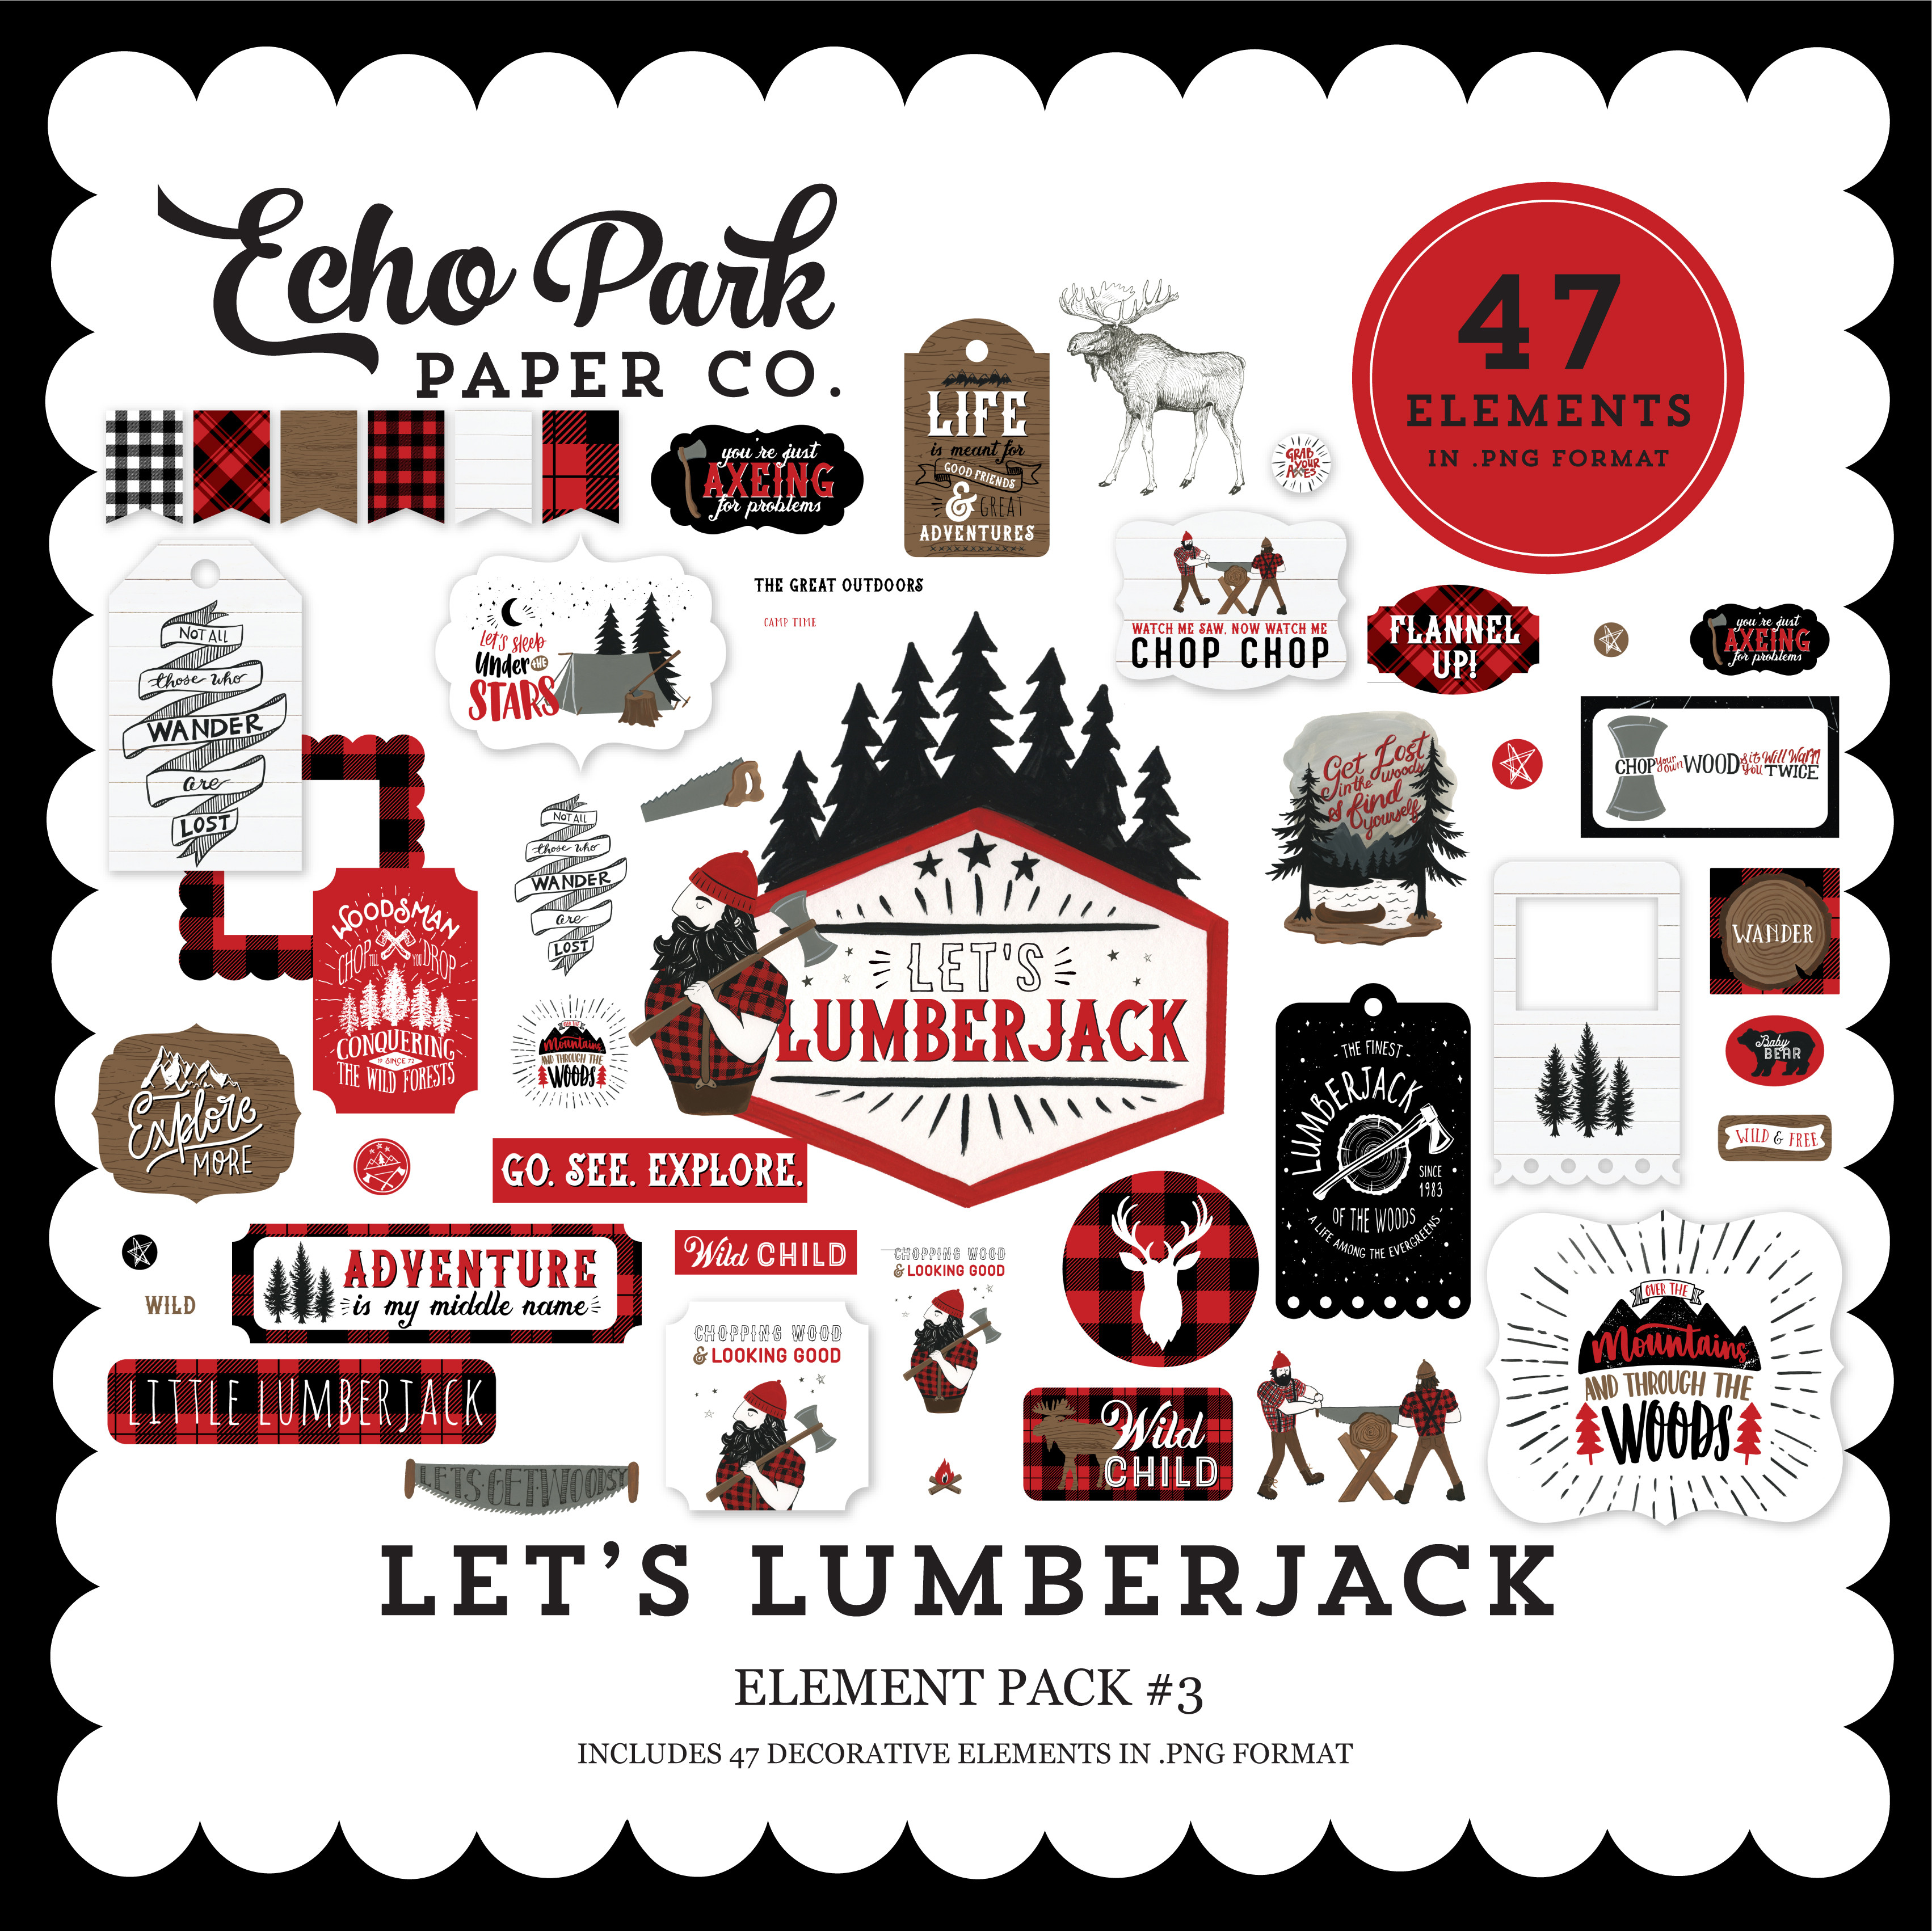 Let's Lumberjack Mega Collection